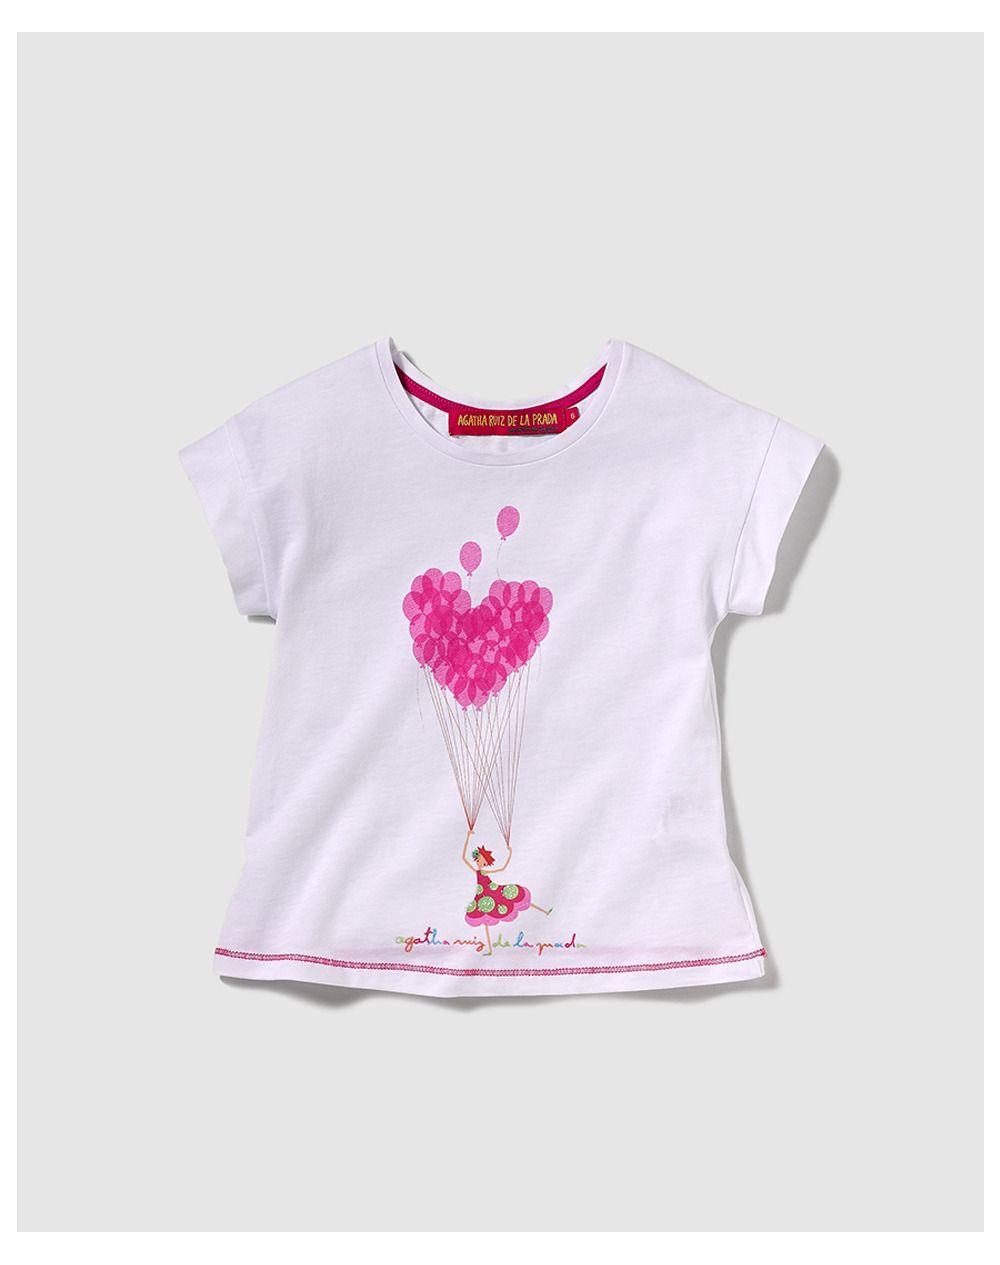 8 Días de Oro Infantil - Camiseta de niña Blanco | Moda El Corte Inglés